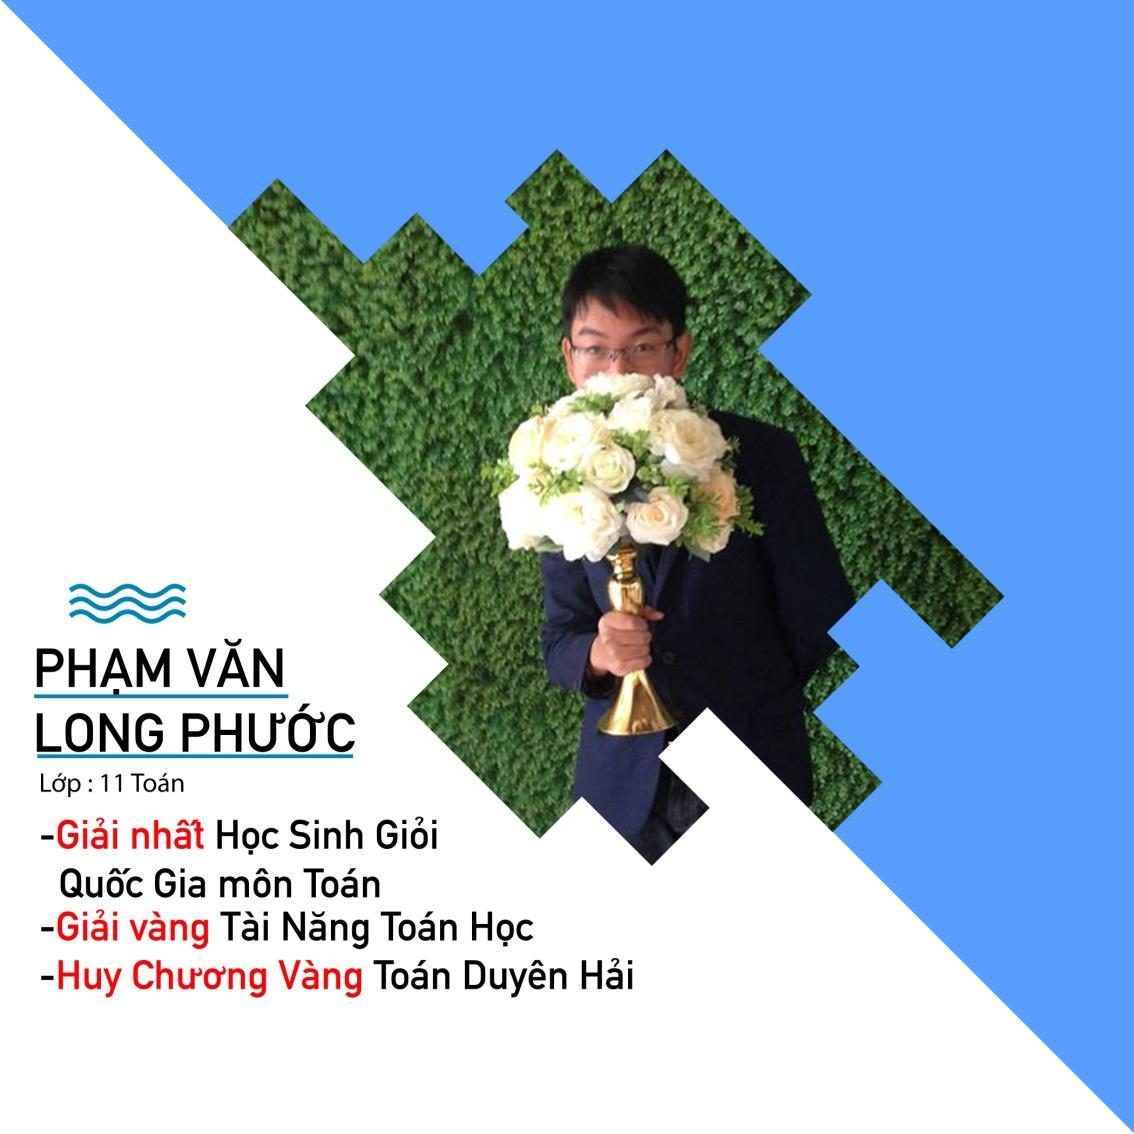 C:\Users\QuangHanh\Downloads\phuoc2.jpg